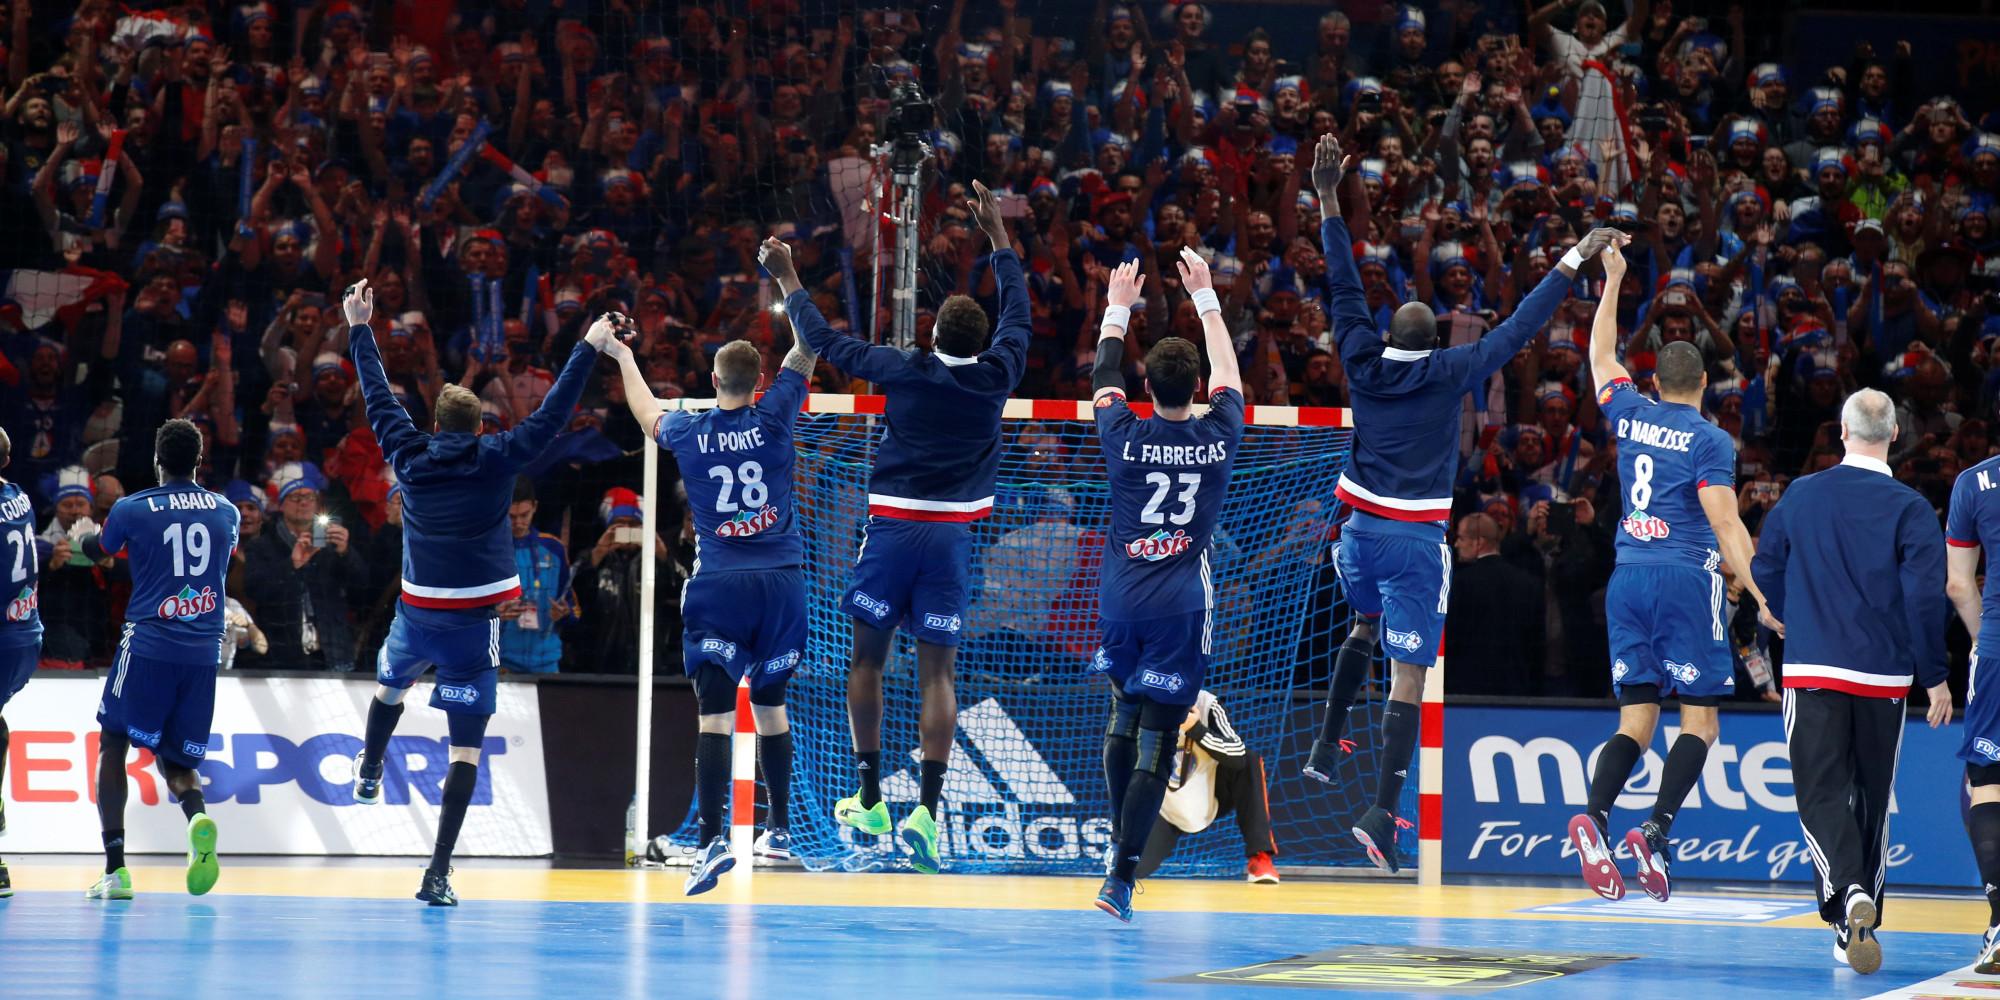 handball finale stream